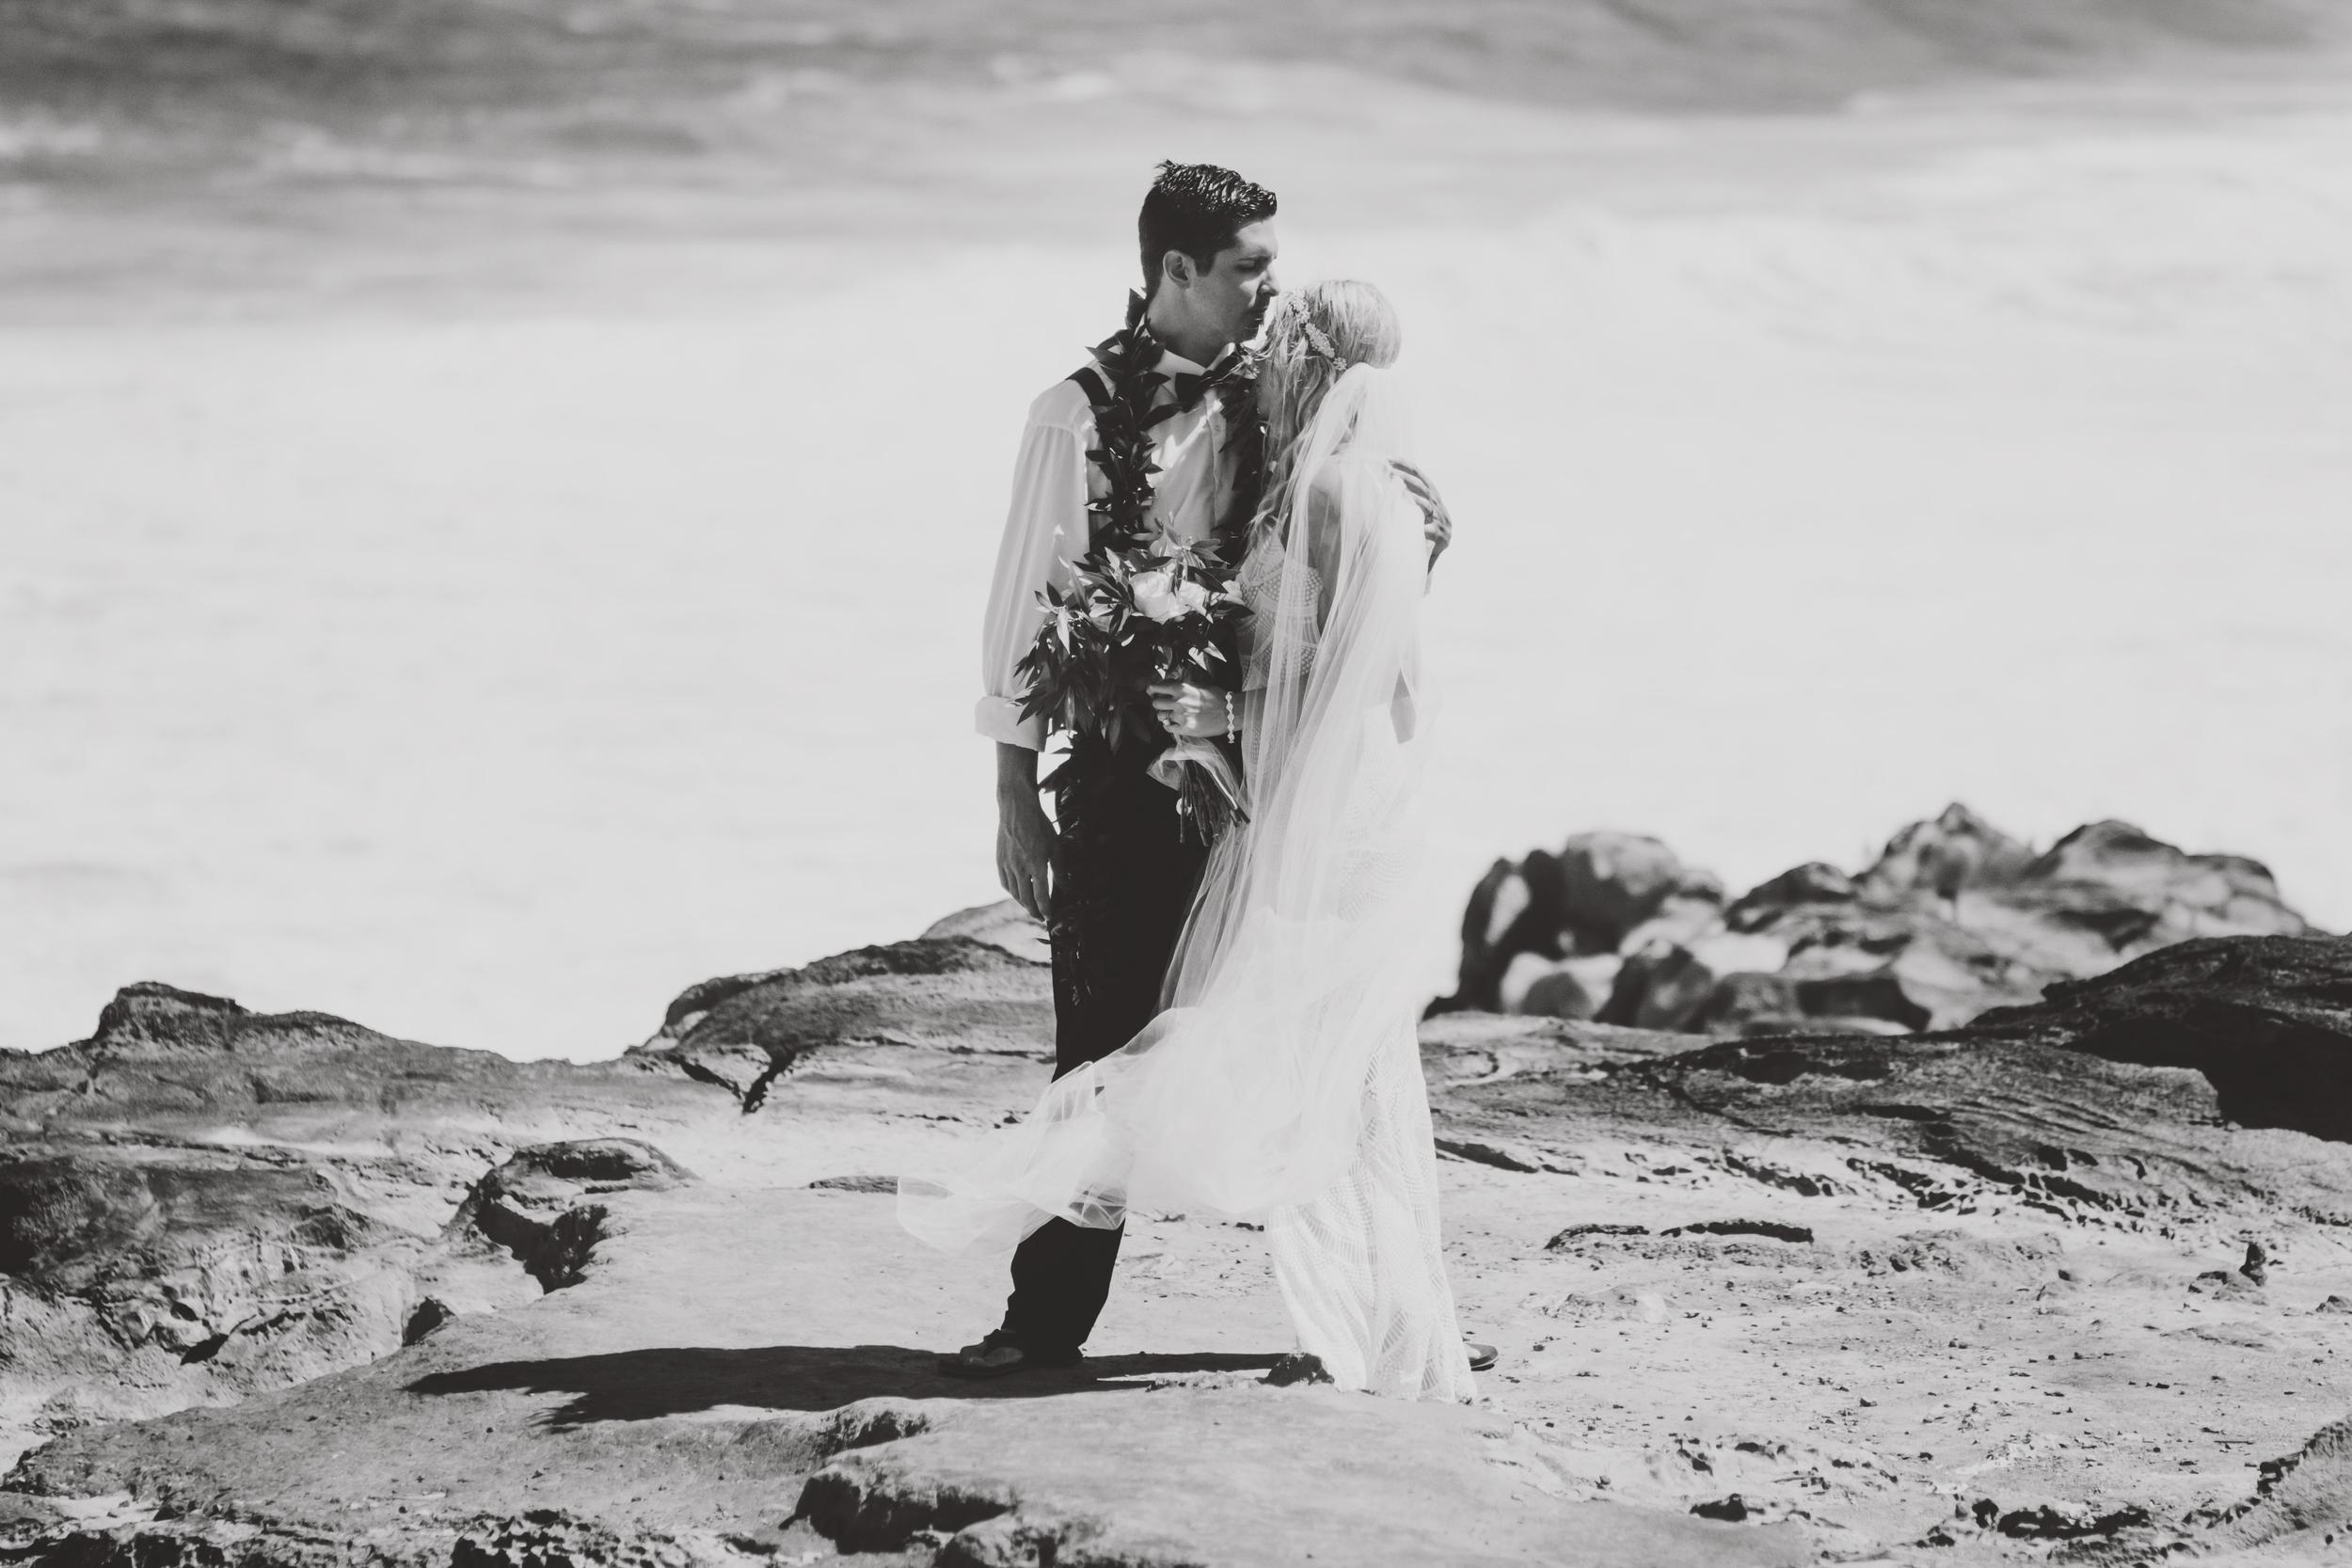 angie-diaz-photography-hawaii-wedding-46.jpg